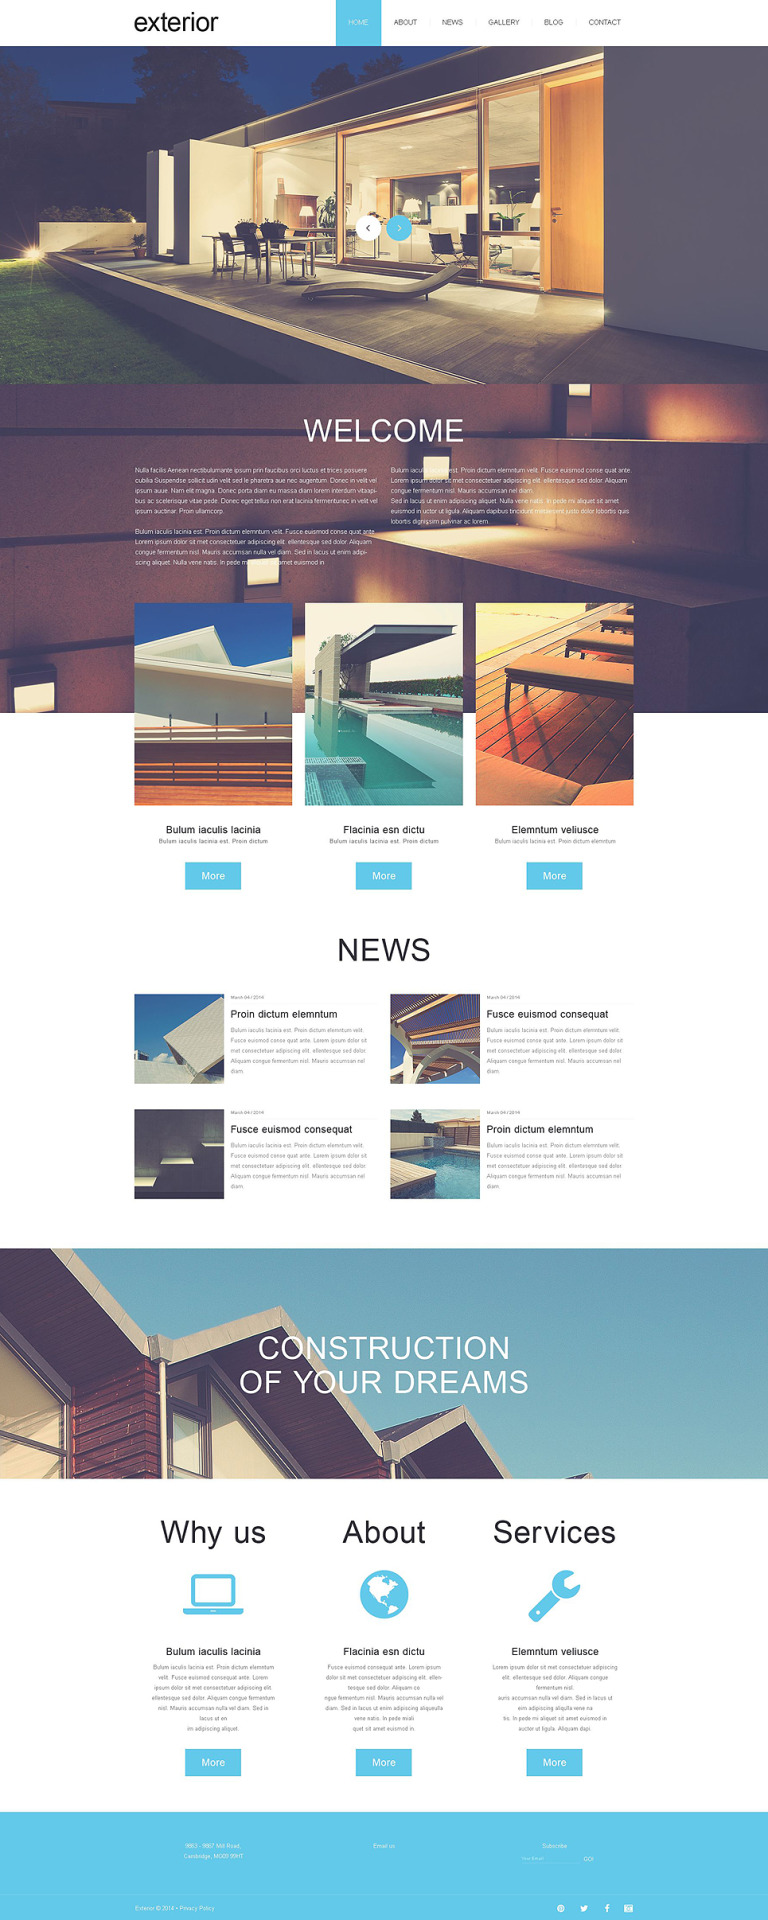 Exterior Design Muse Template New Screenshots BIG